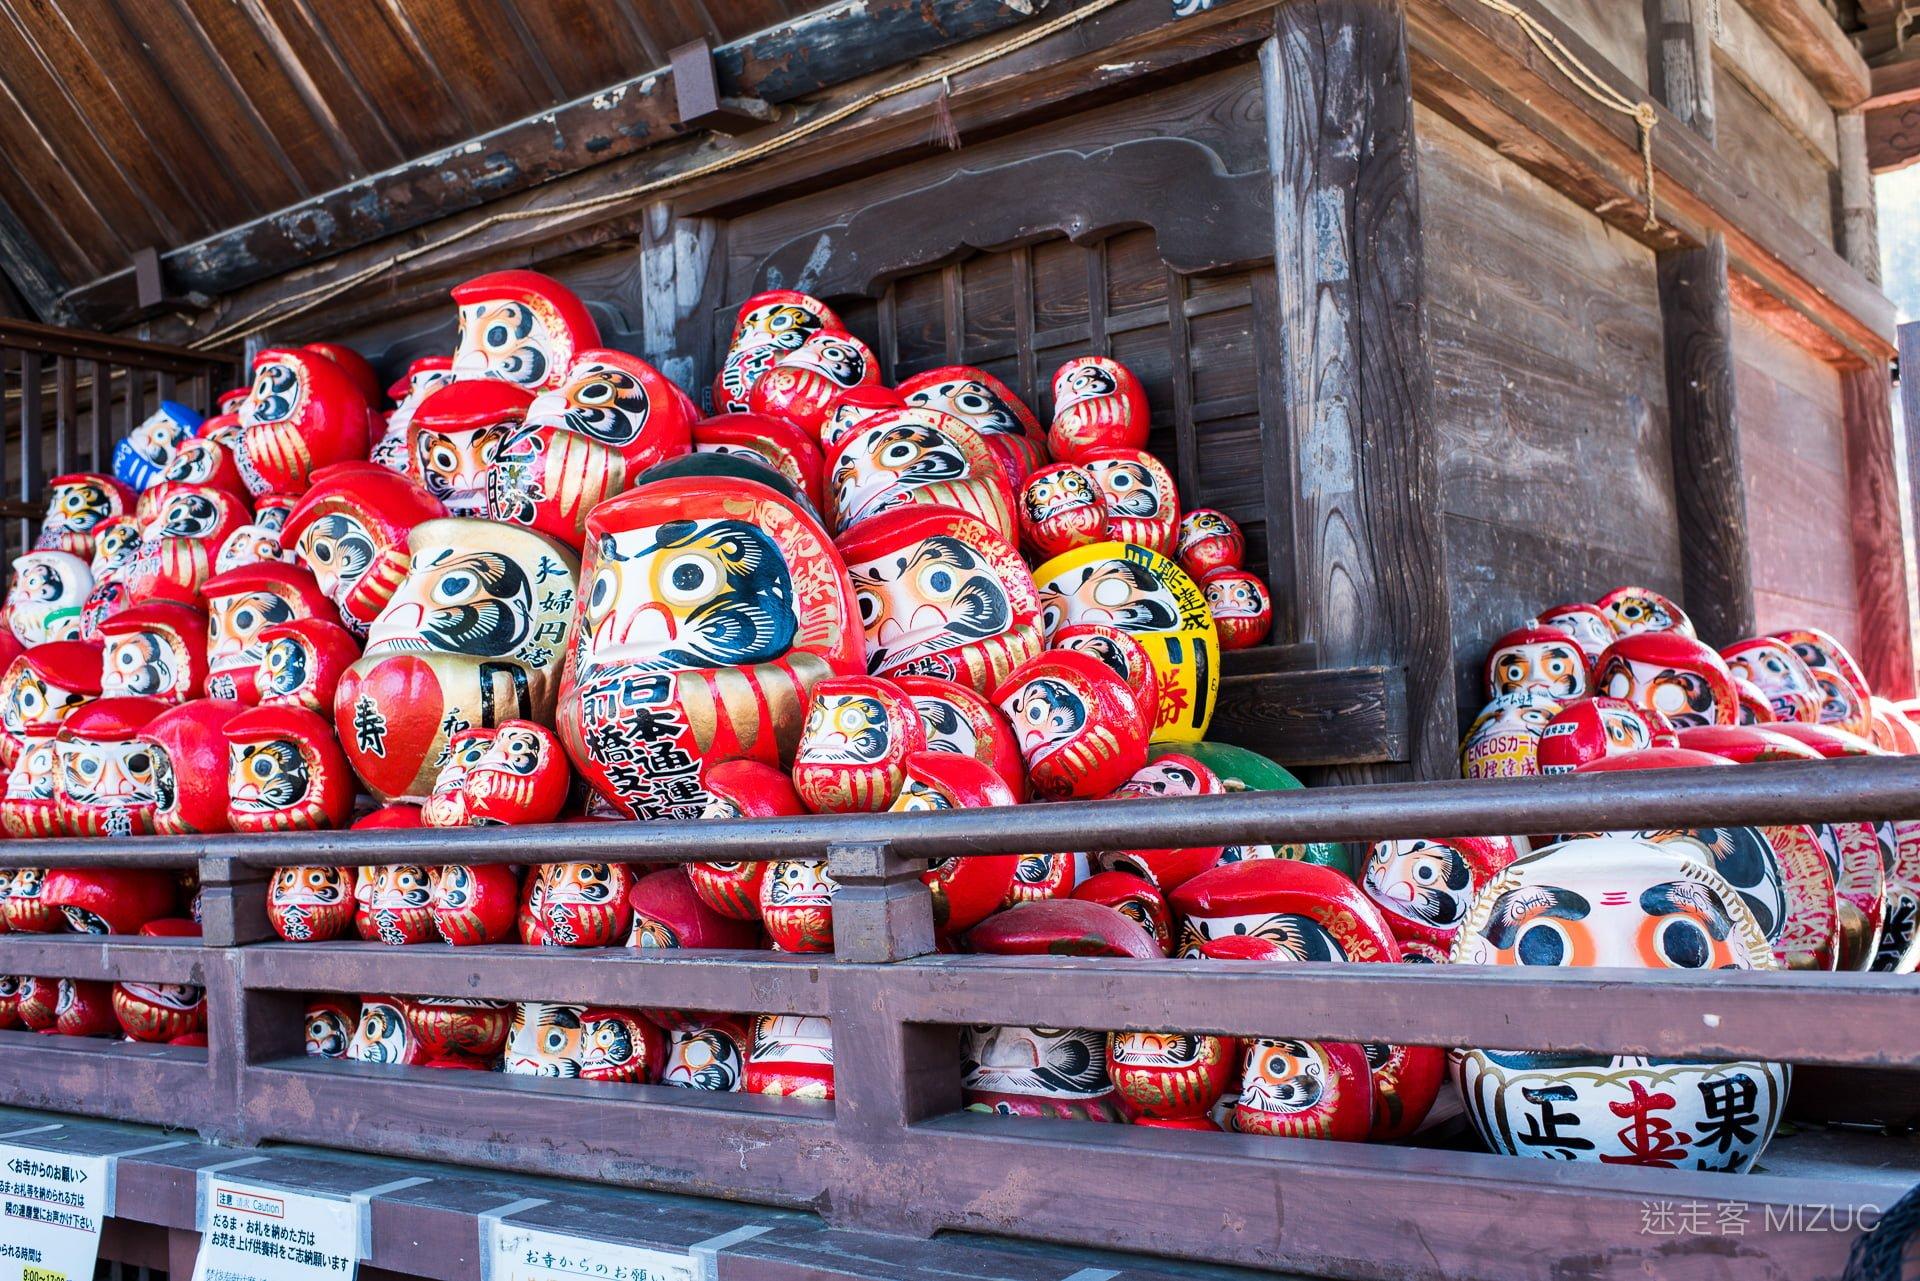 201711 Ibaraki Tochigi Gunma Japan Travel By RentalCar 87 日本自駕旅遊/北關東三縣「茨城、櫪木、群馬」秋天美食、溫泉與瀑布秘境百景(精選照片分享)